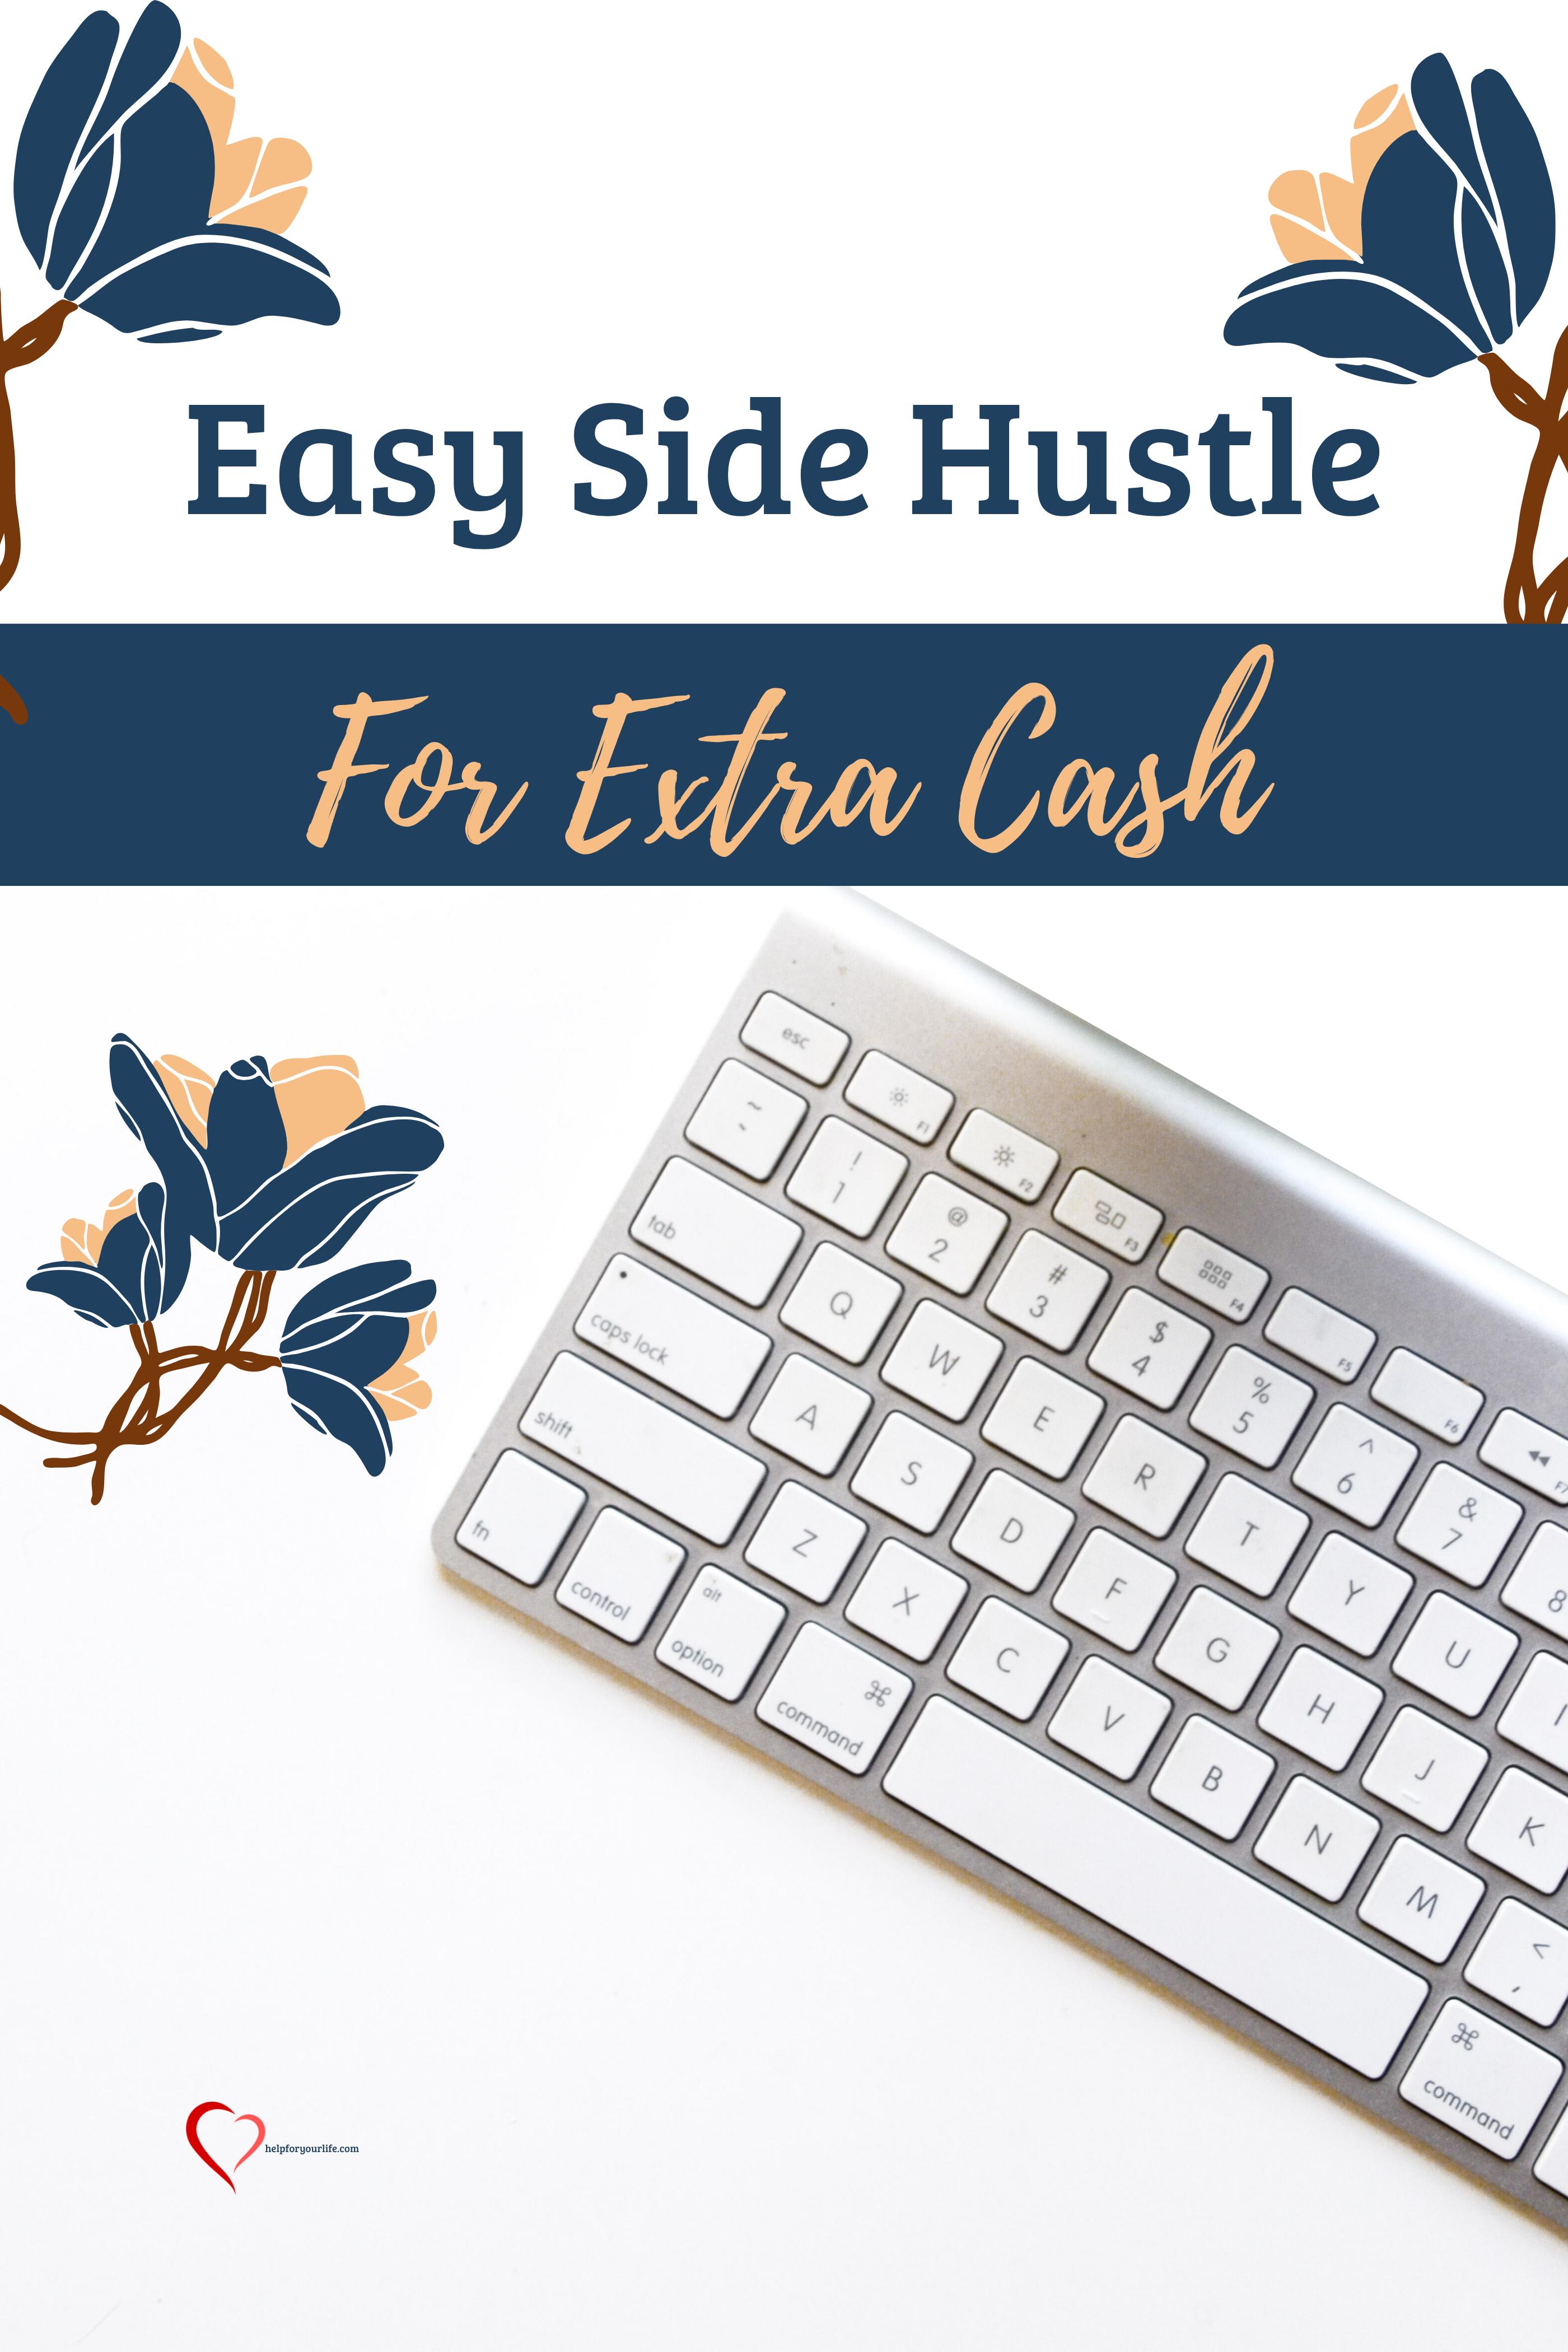 Easy Side Hustle For Extra Cash In